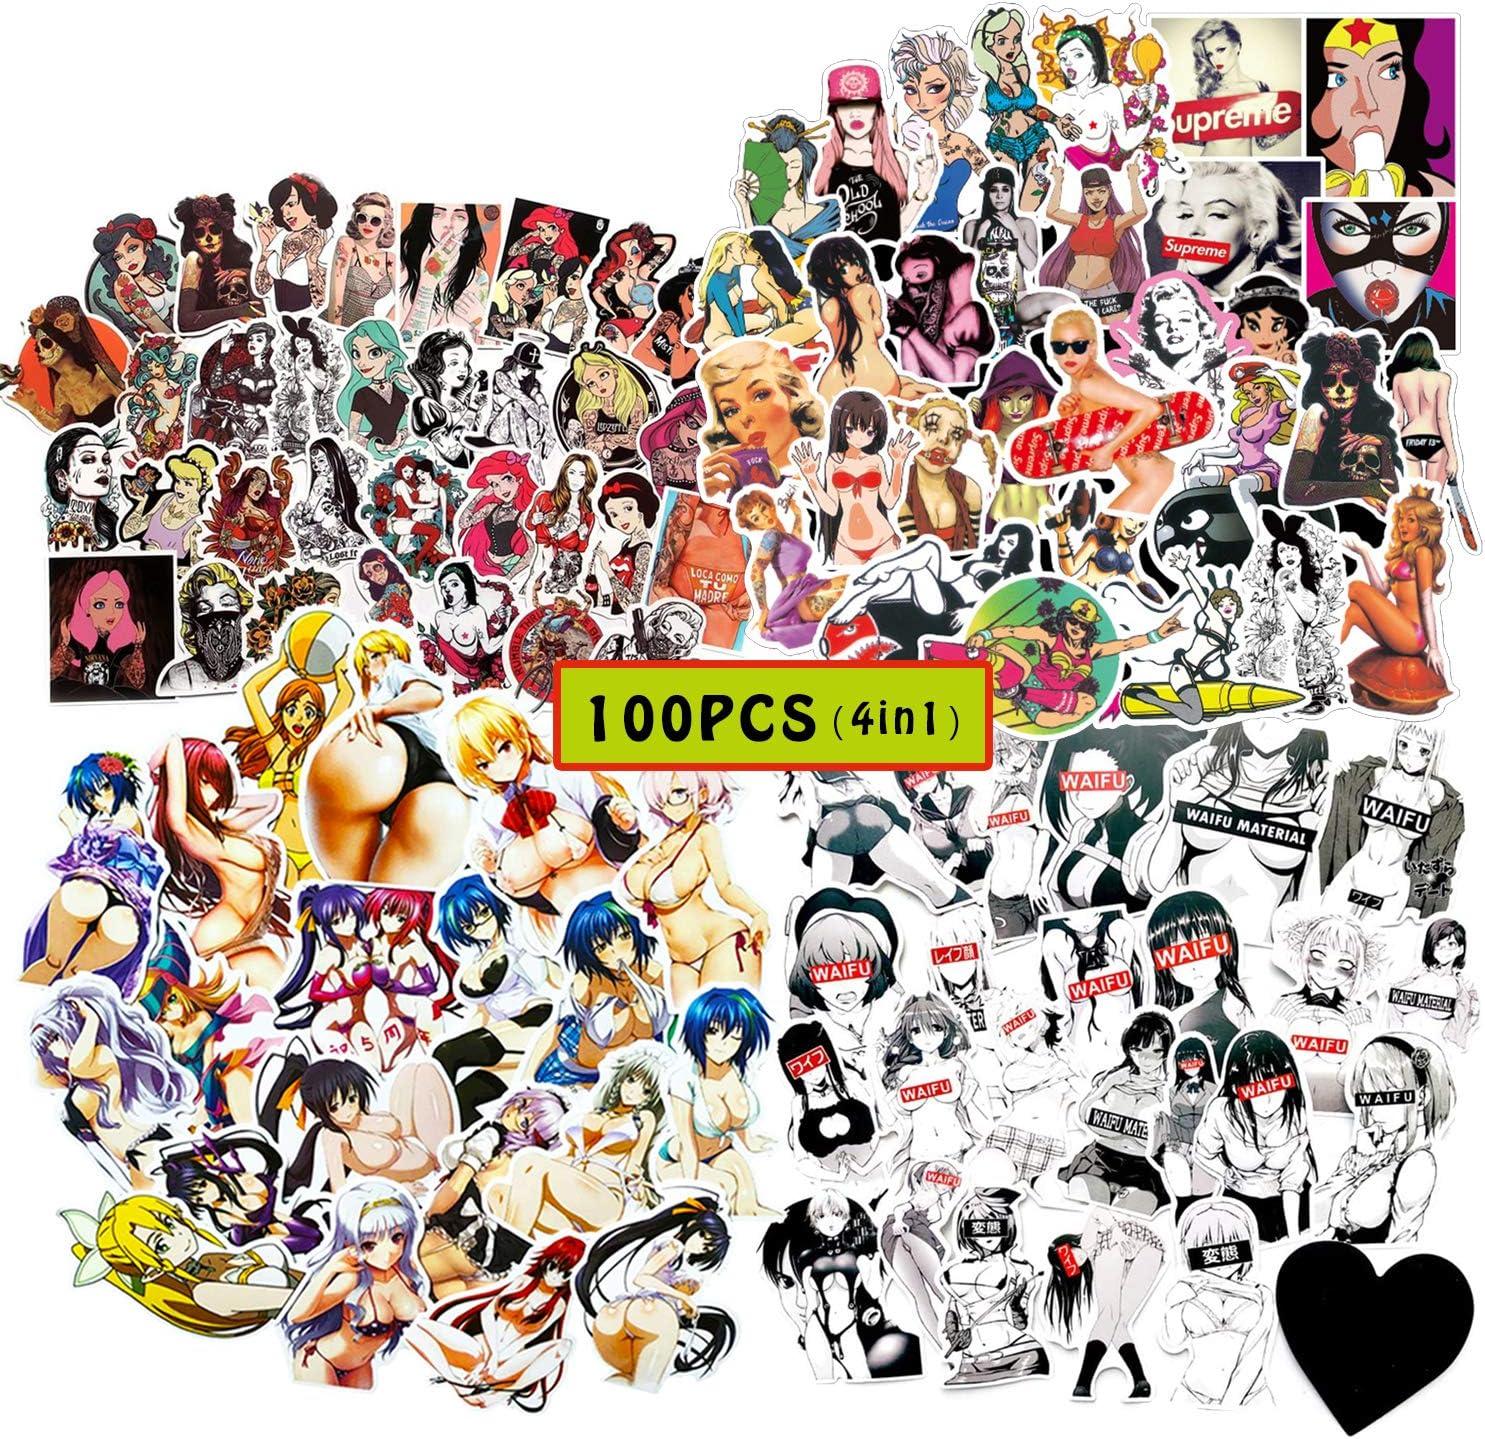 Kilmila Bunny Anime Sexy Girl Stickers [100 pcs] Cute Lady & Loli Sticker for Adult, Laptop Water Bottle Bike Car Motorcycle Bumper Luggage Skateboard Graffiti